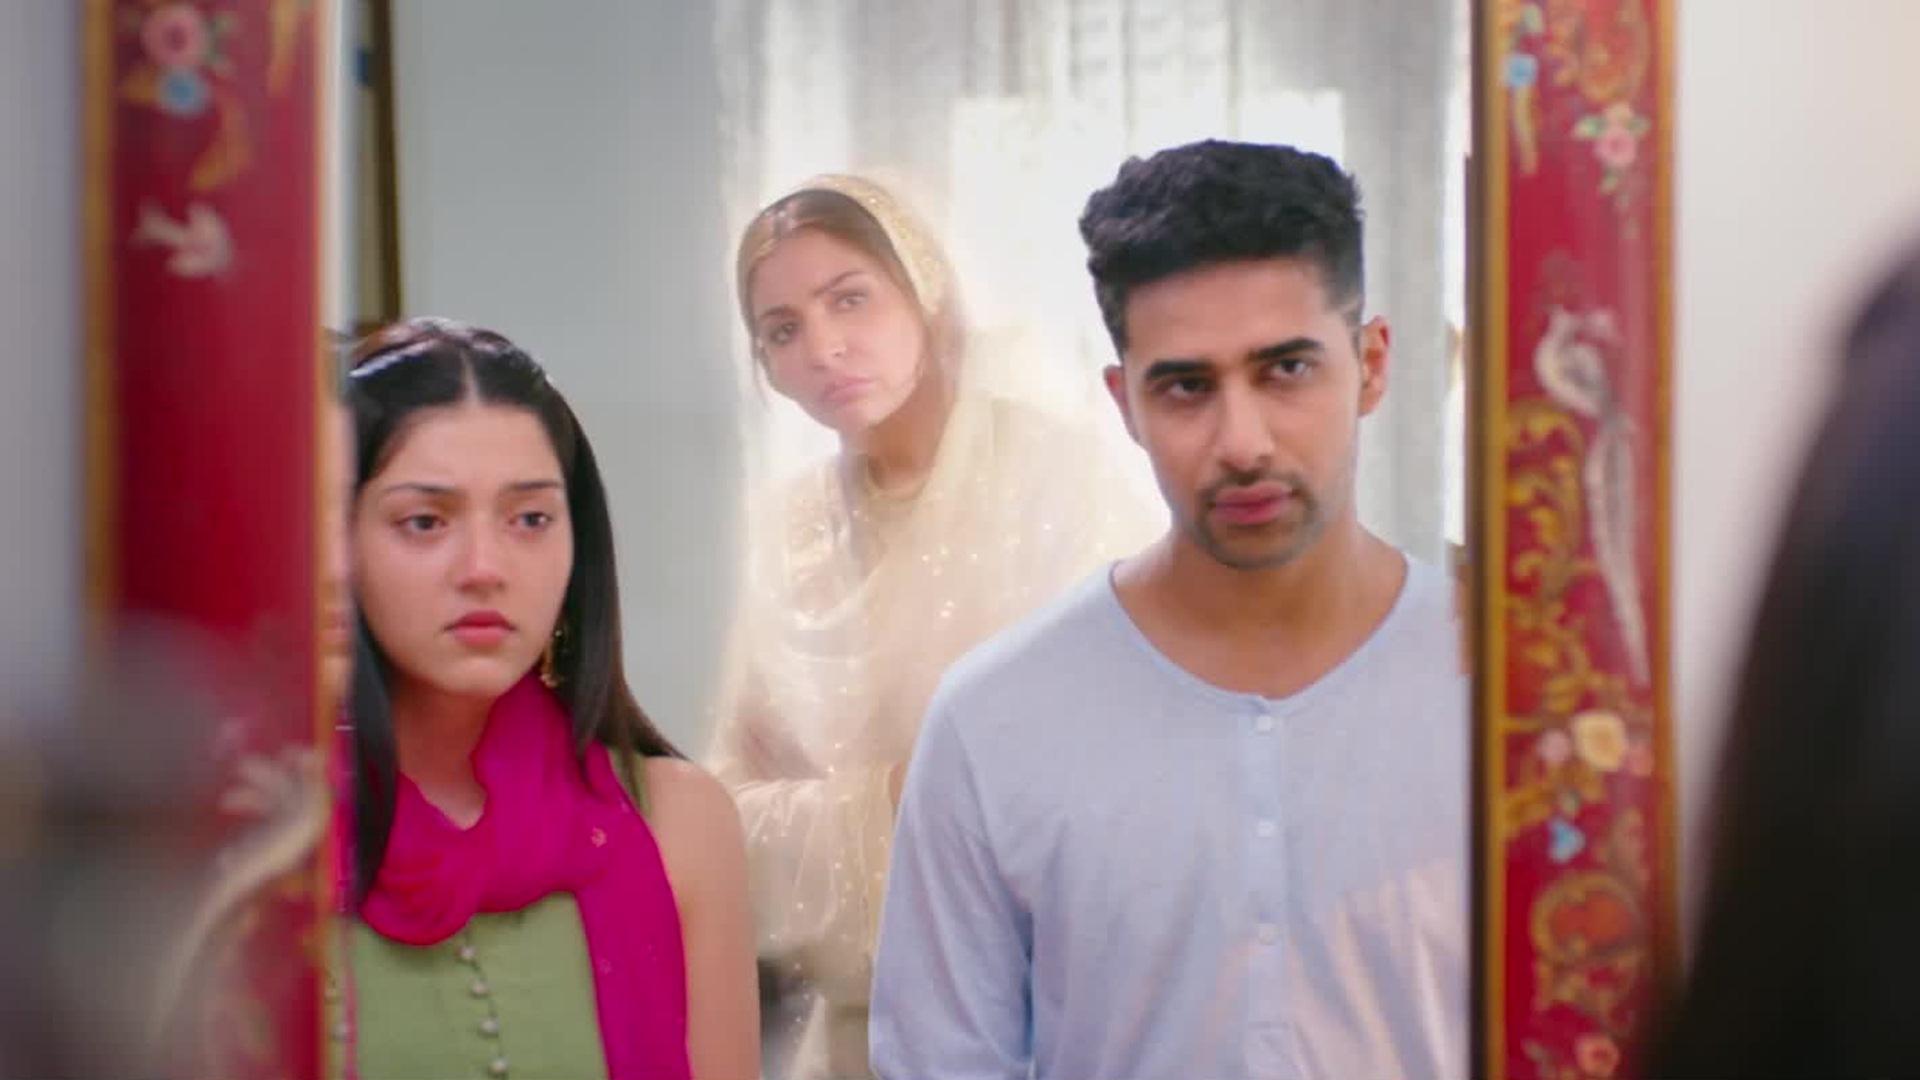 Suraj seems a little uncomfortable in a 'filmi' set up